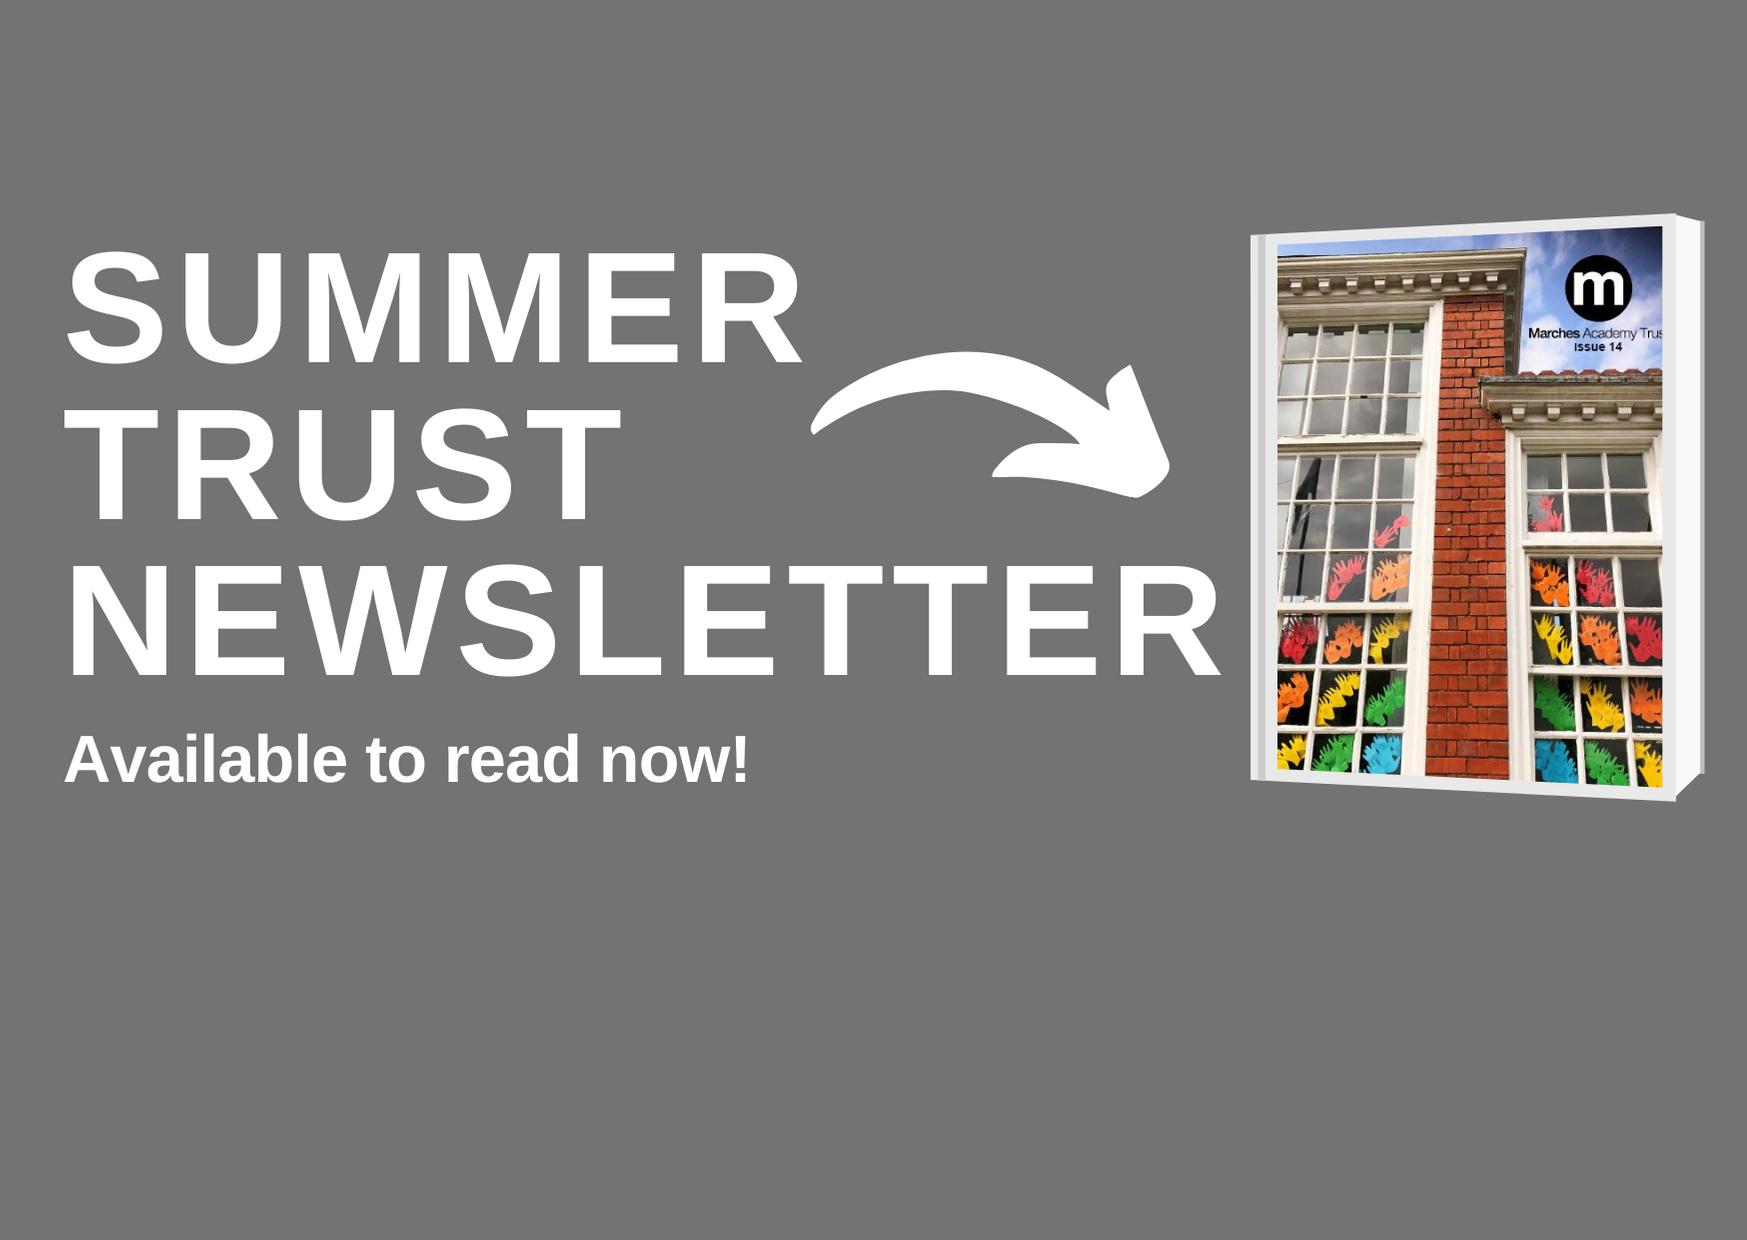 Summer Trust Newsletter